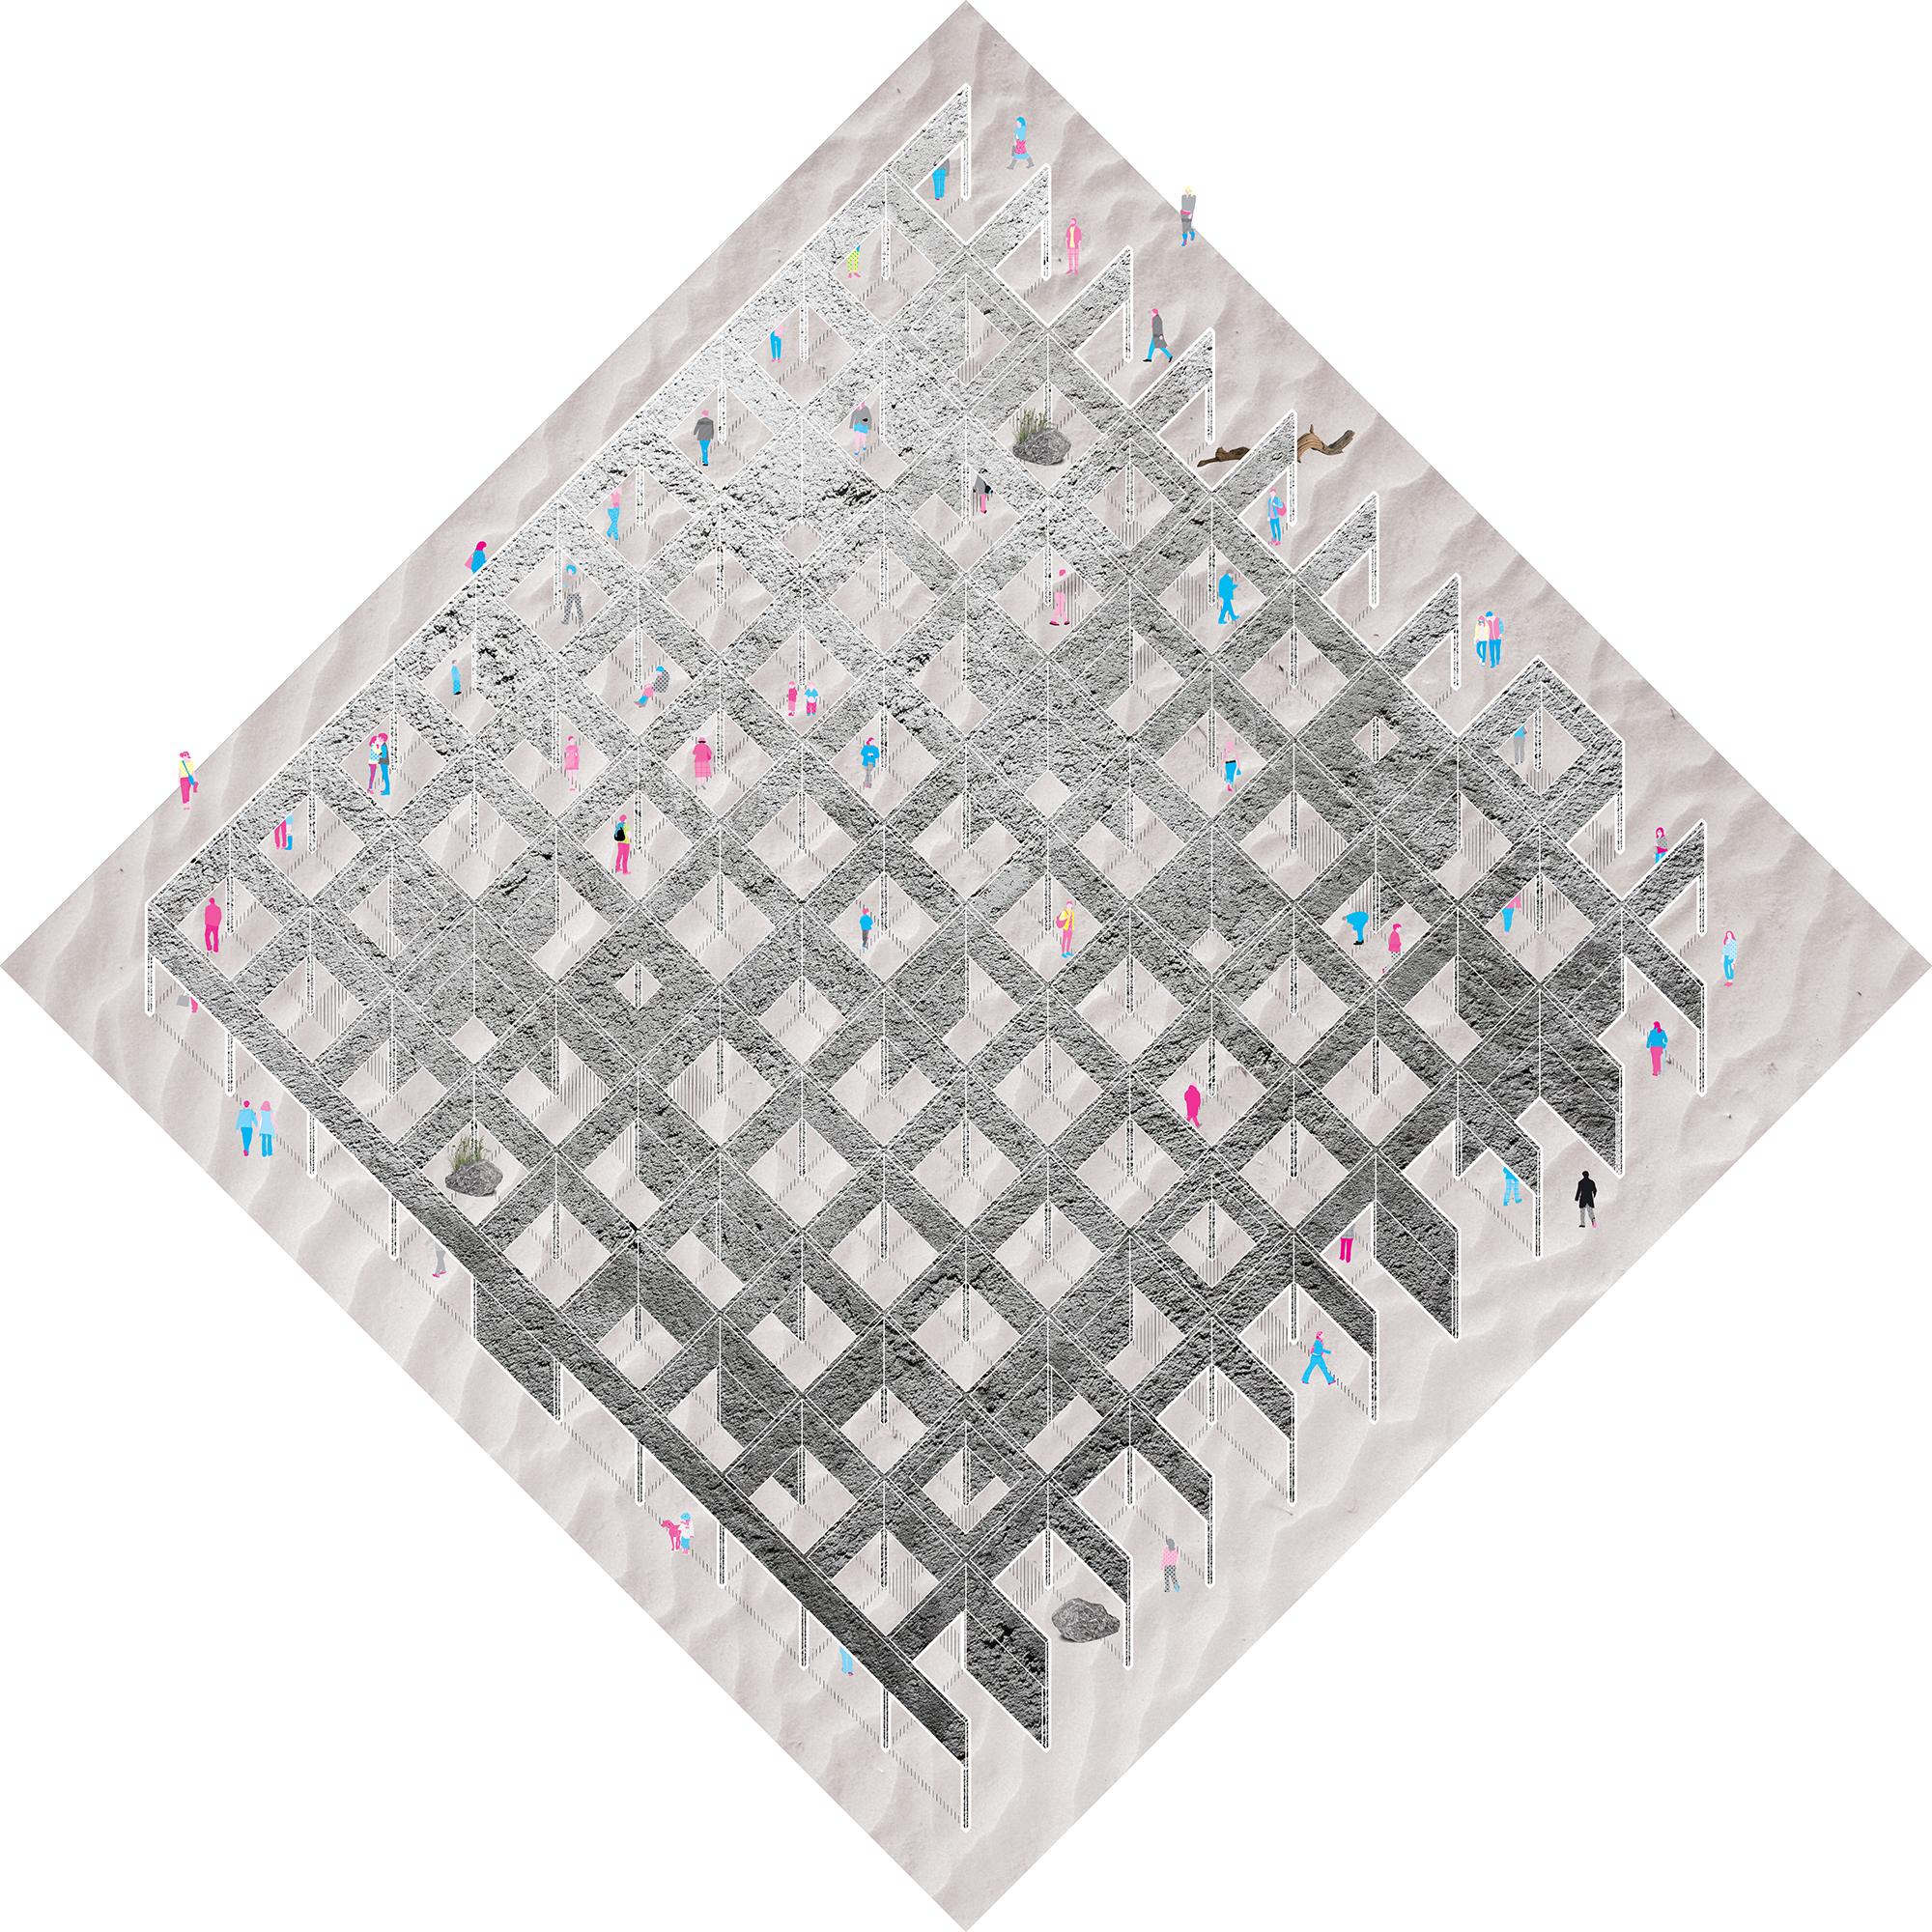 Axon-02LowRes.jpg